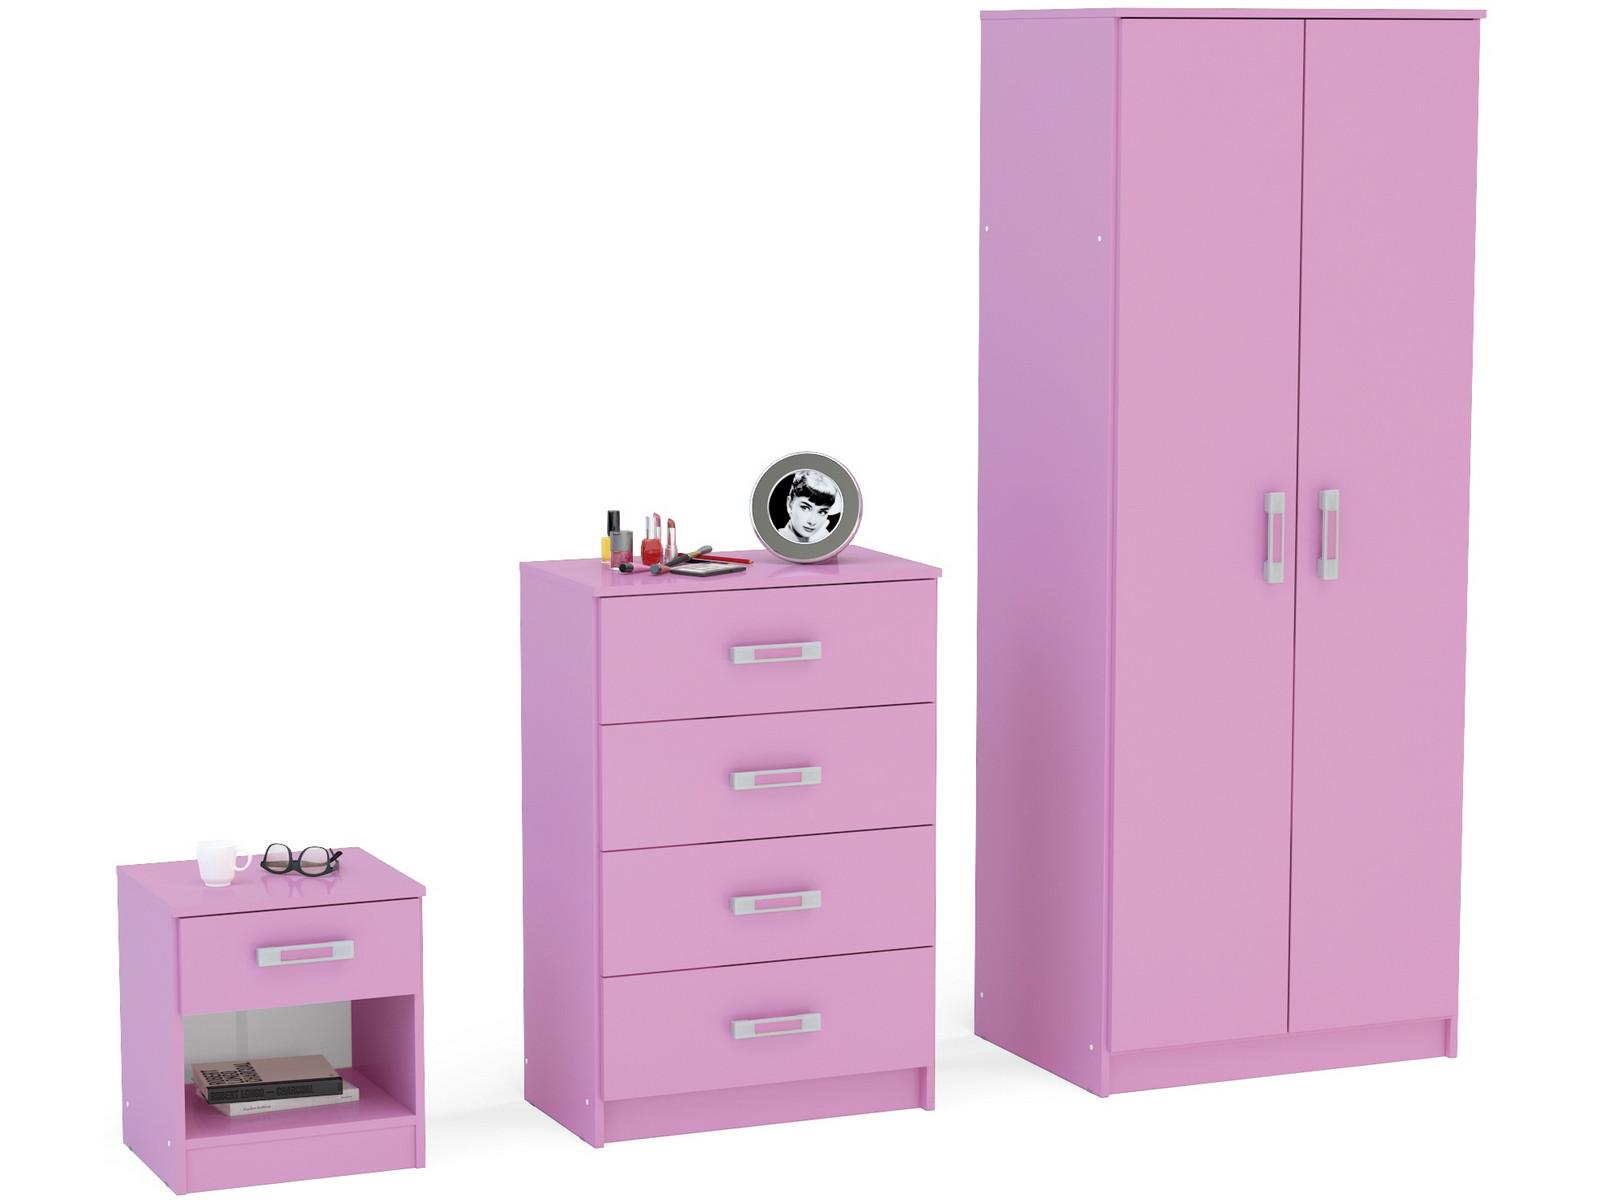 Reflect PINK High Gloss Girls Bedroom Furniture Set Wardrobe Chest Bedside